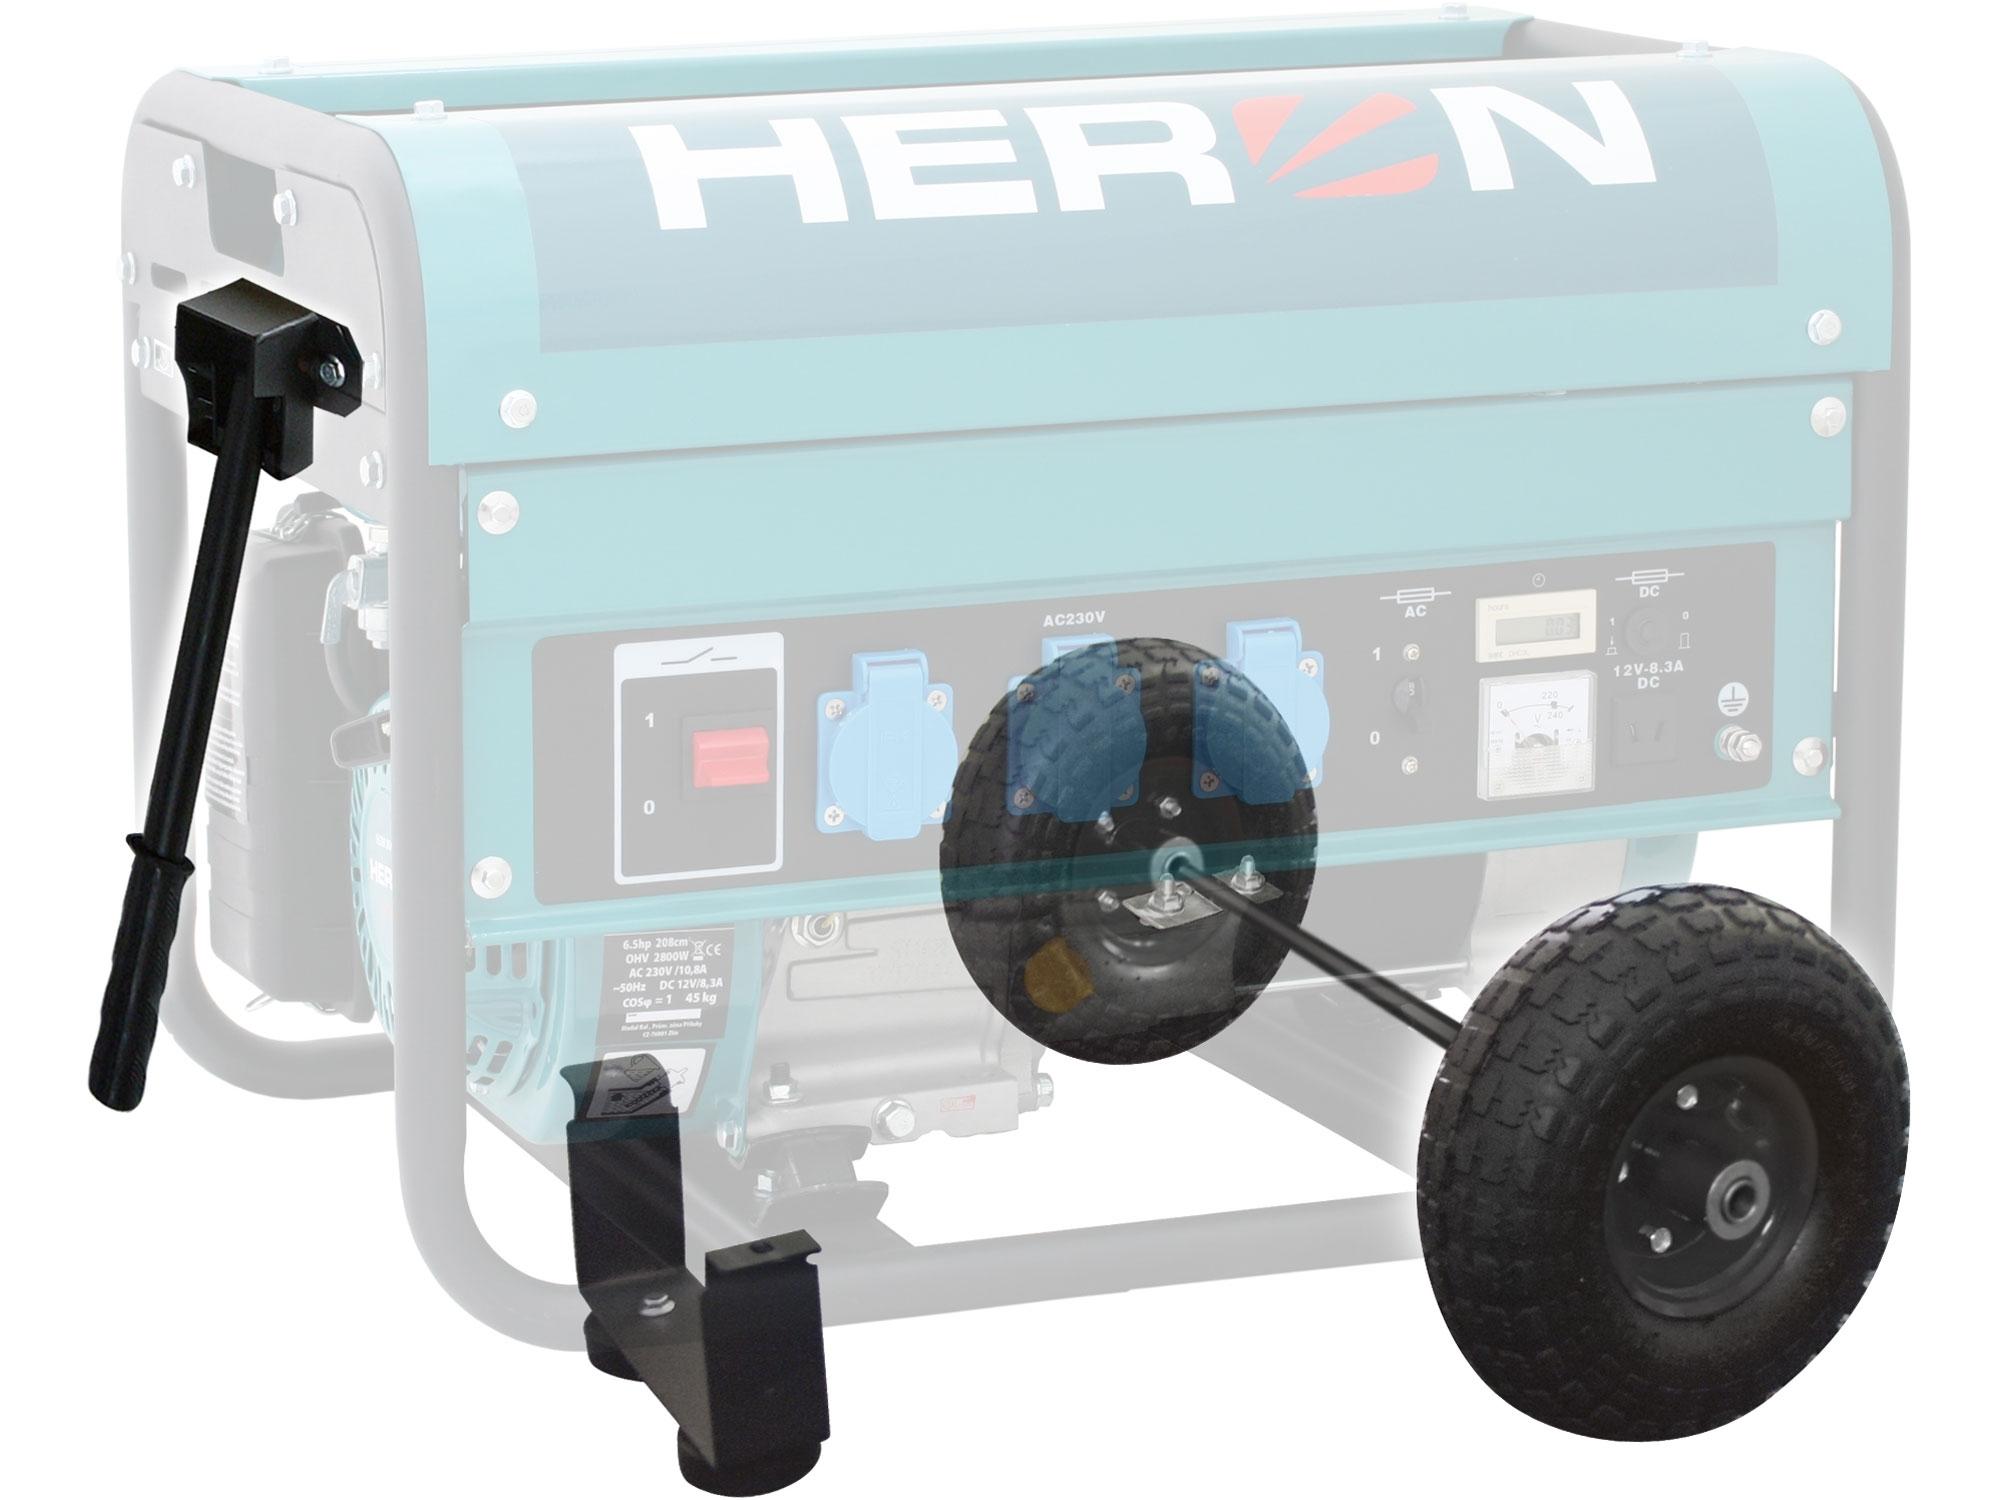 Podvozková sada pro elektrocentrály HERON CHS 25-30 8898104